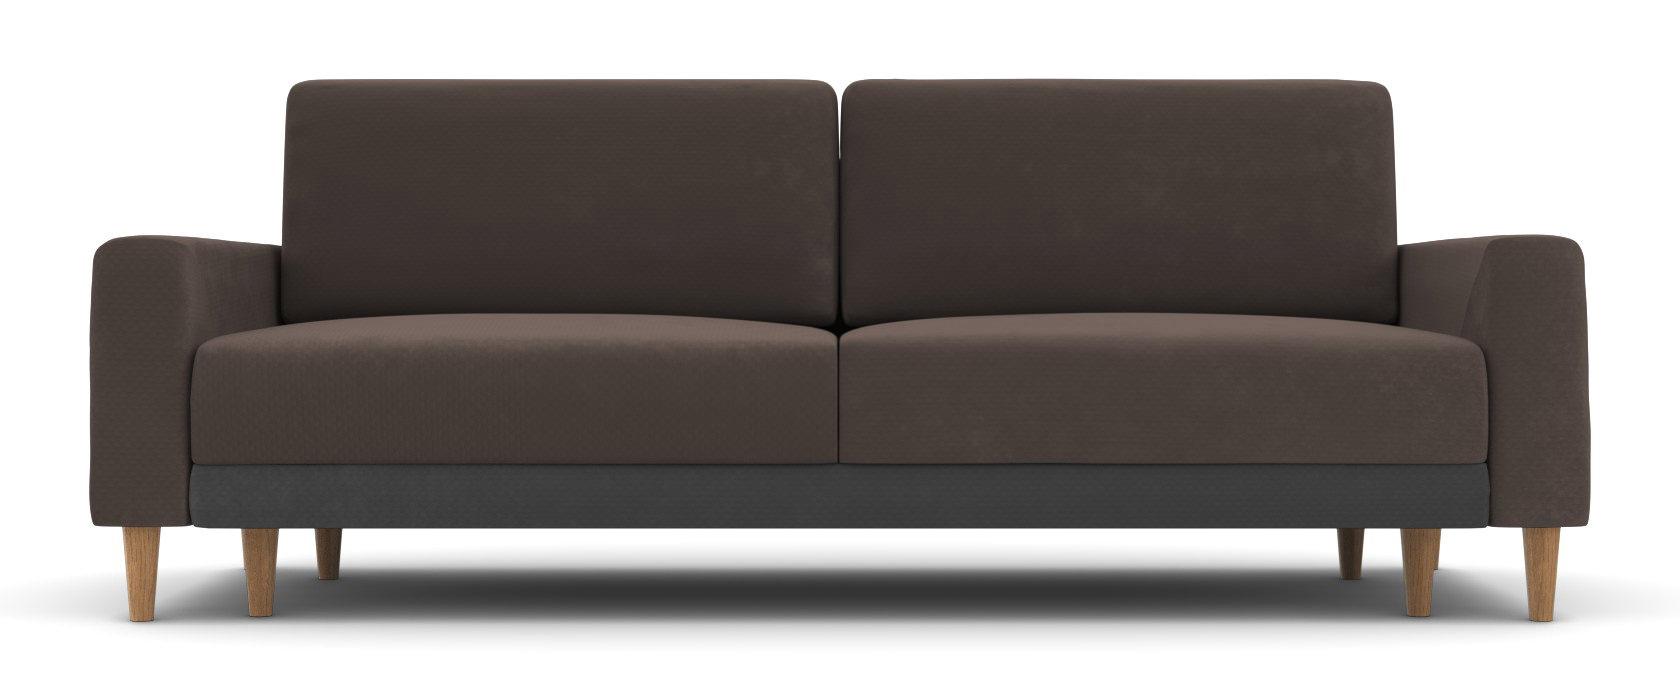 Тримісний диван Fredo - Pufetto